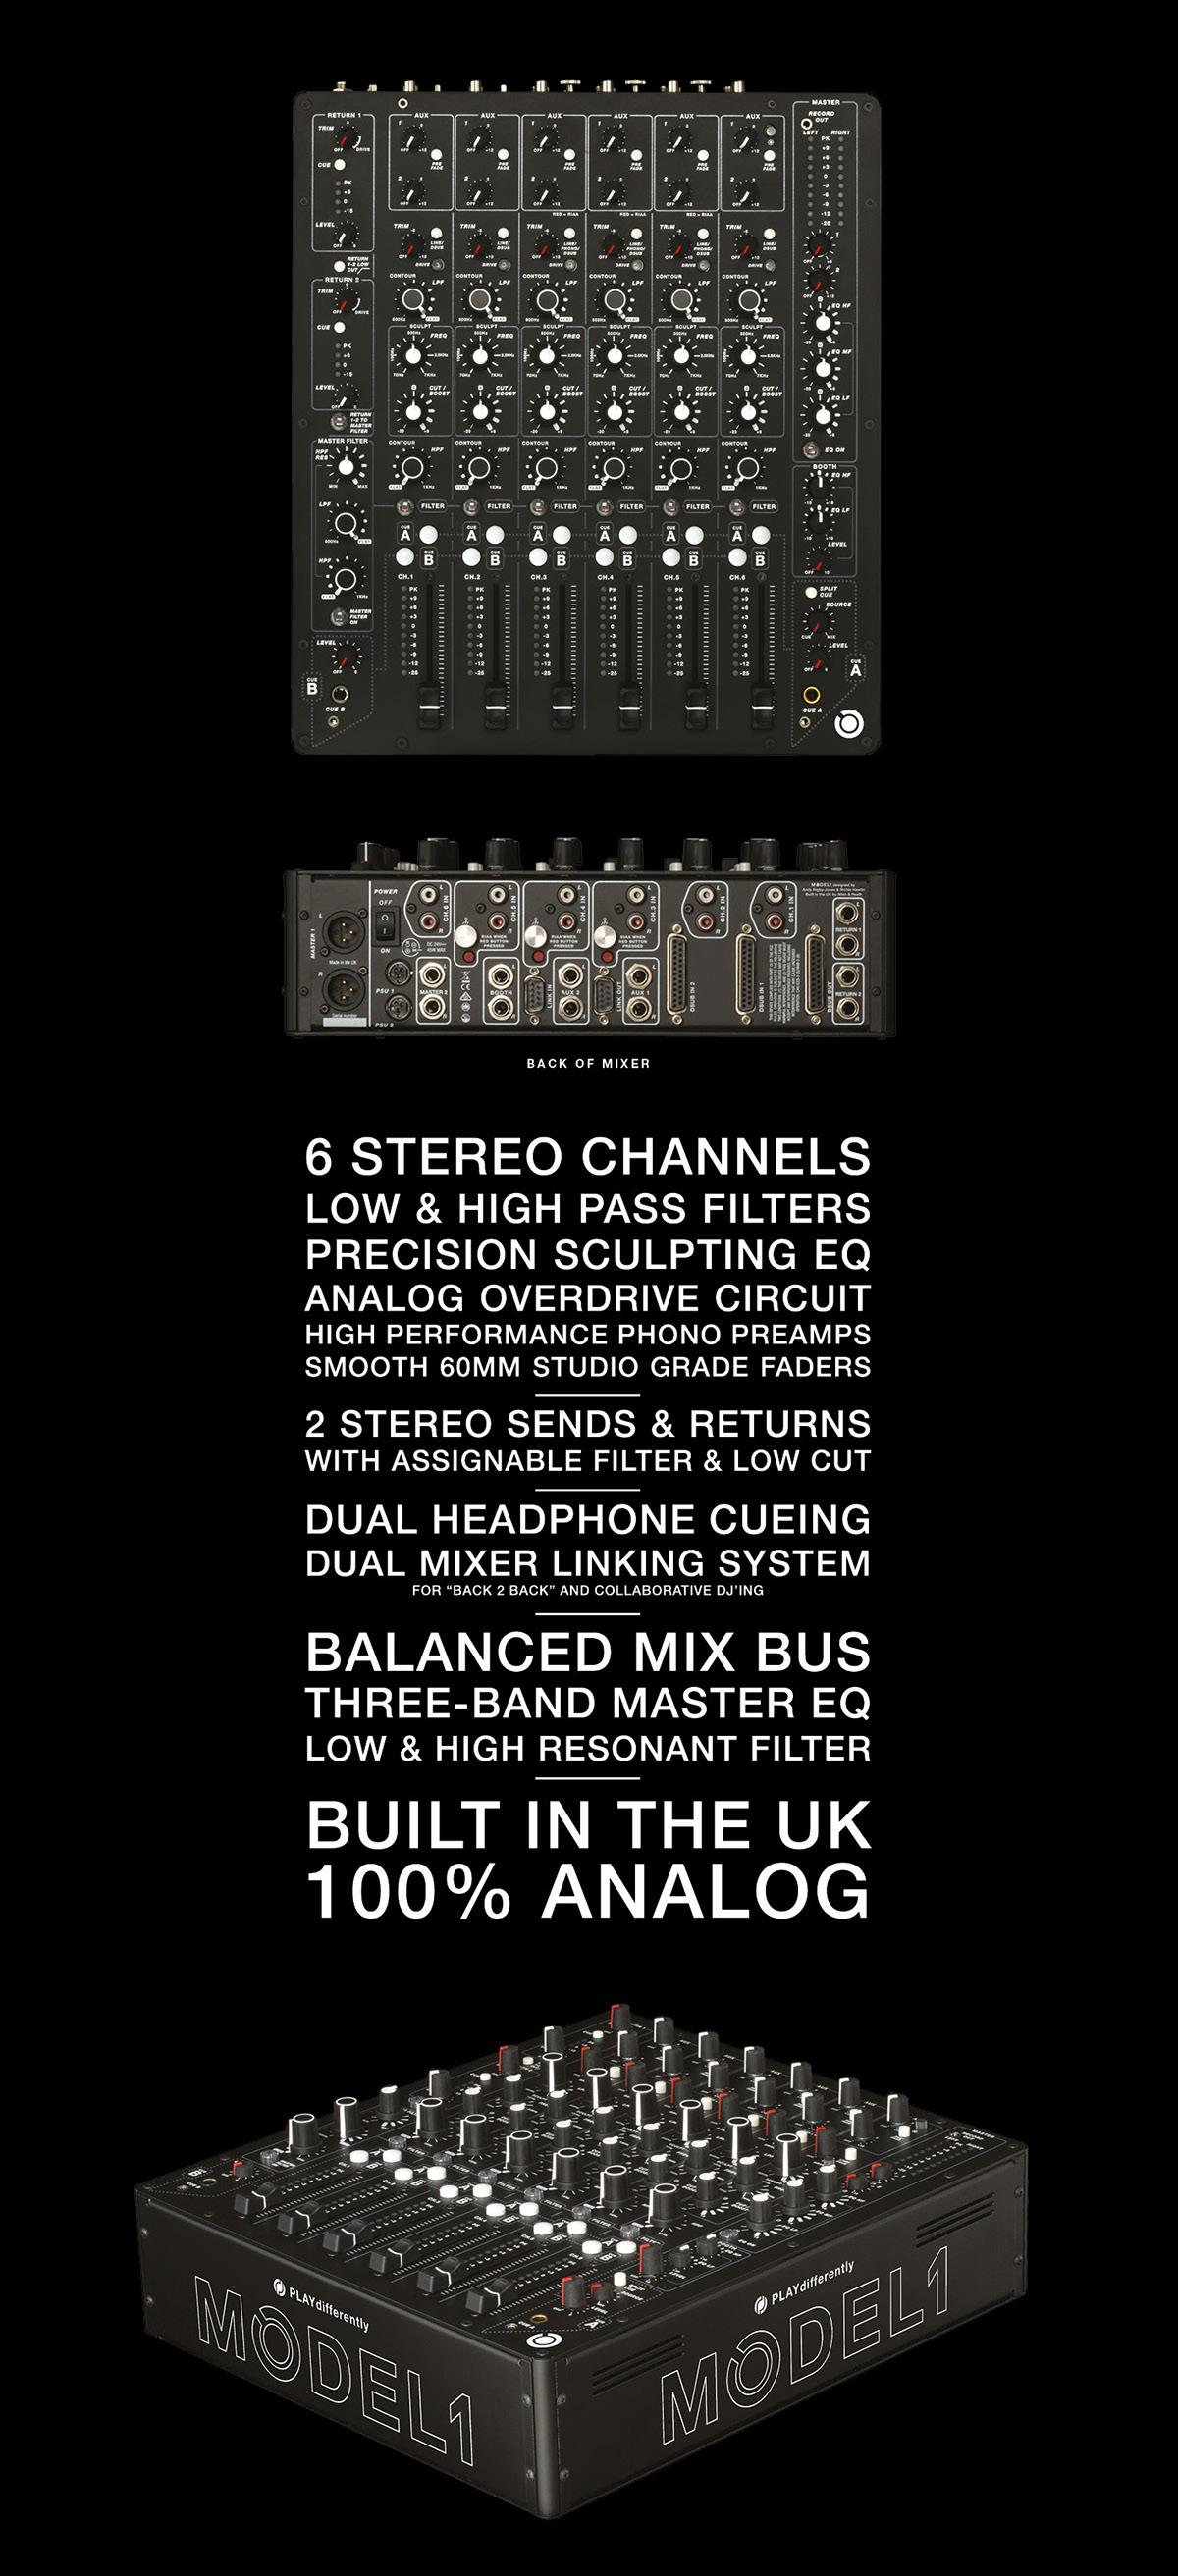 MODEL1 PLAYdifferently richie hawtin Andy Rigby-Jones mixer boiler room dj